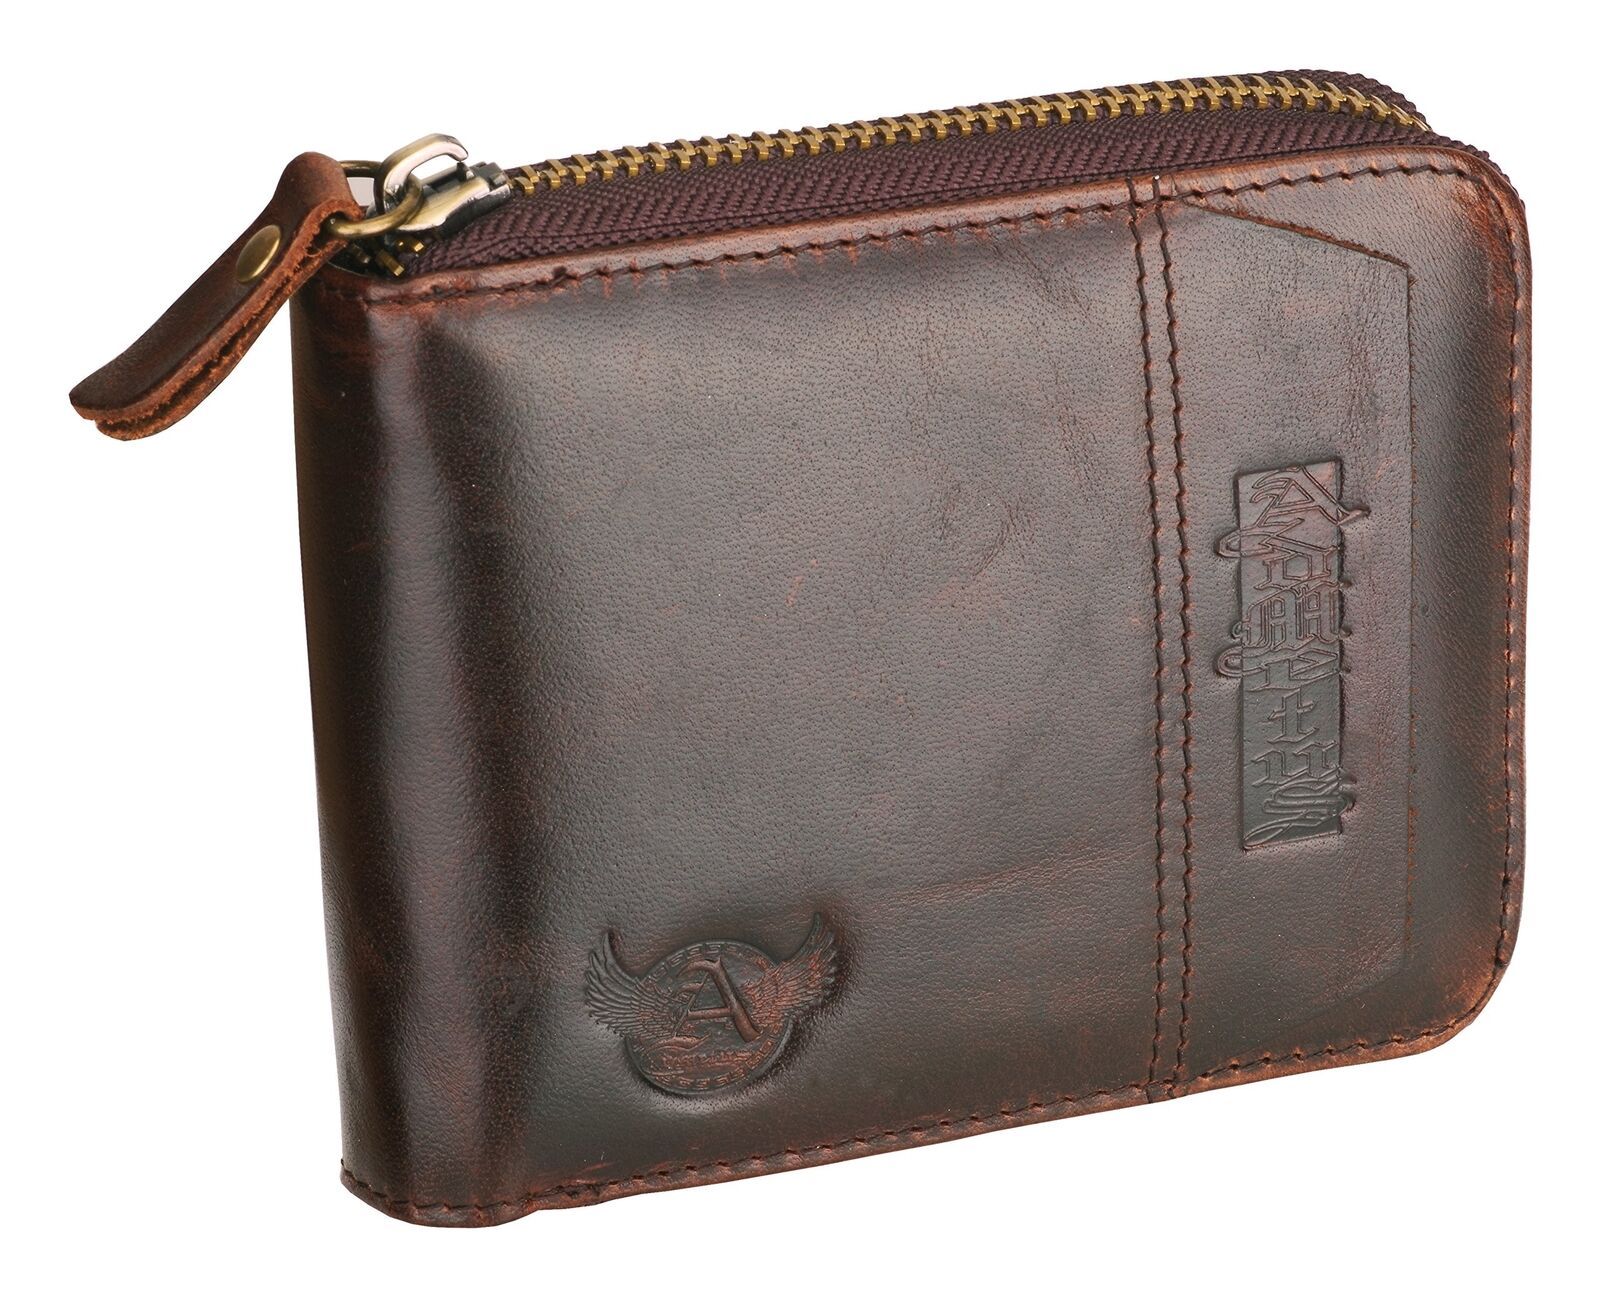 ADEDIY Custom Wallet Douglas-Grey-Tartan Mens Leather Wallet Purse M1612